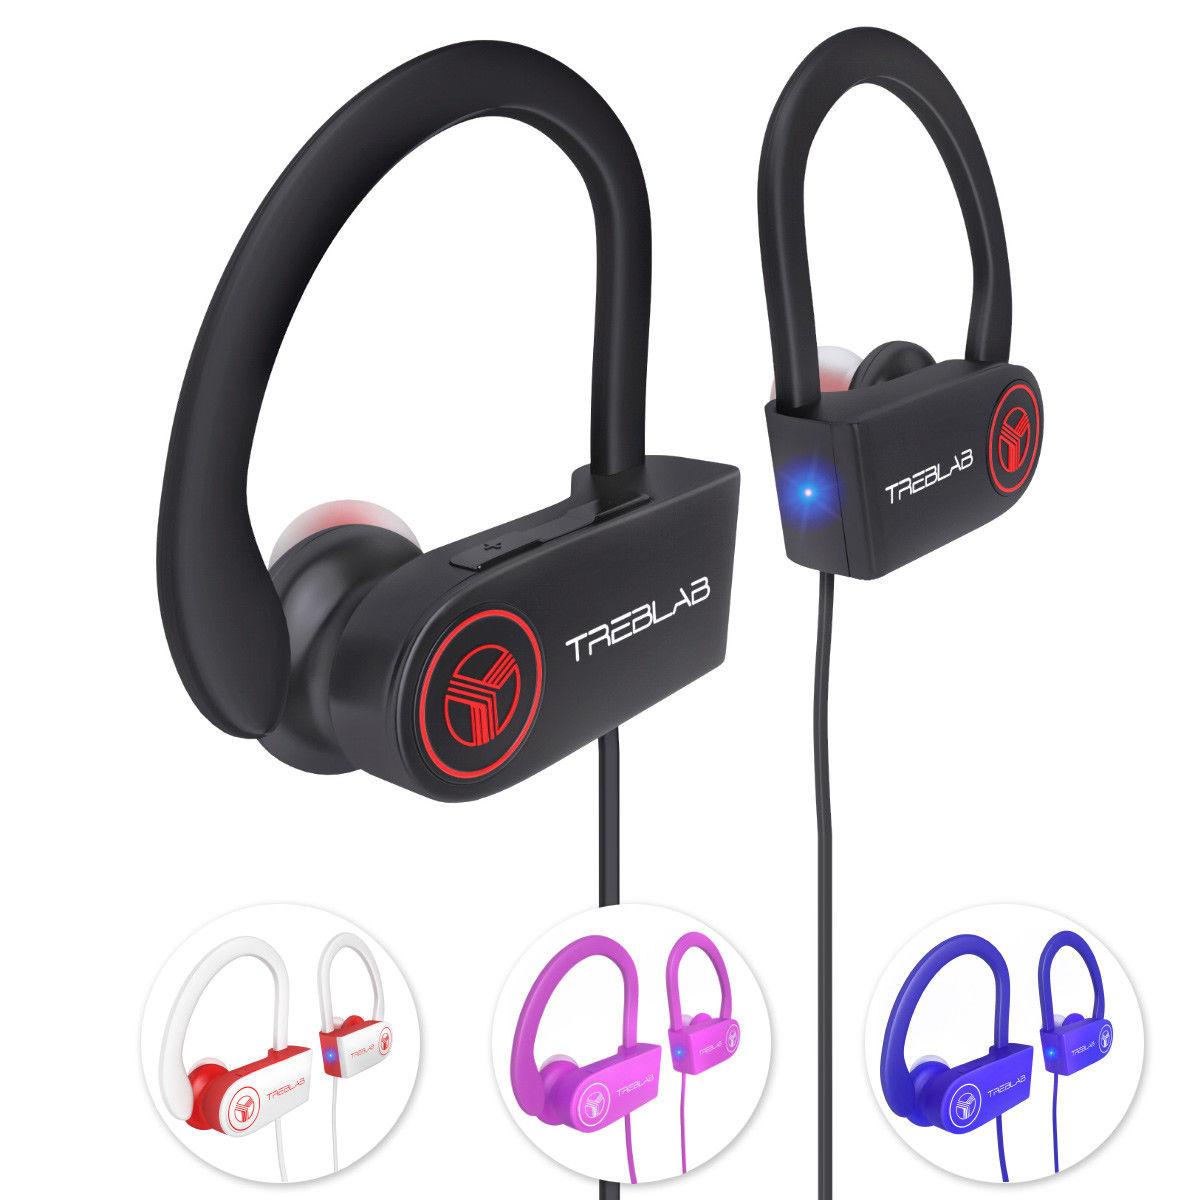 f045e2f6f99 TREBLAB XR100 Bluetooth Sport Headphones, Best Wireless Earbuds for Running  Workout, Noise Cancelling Sweatproof